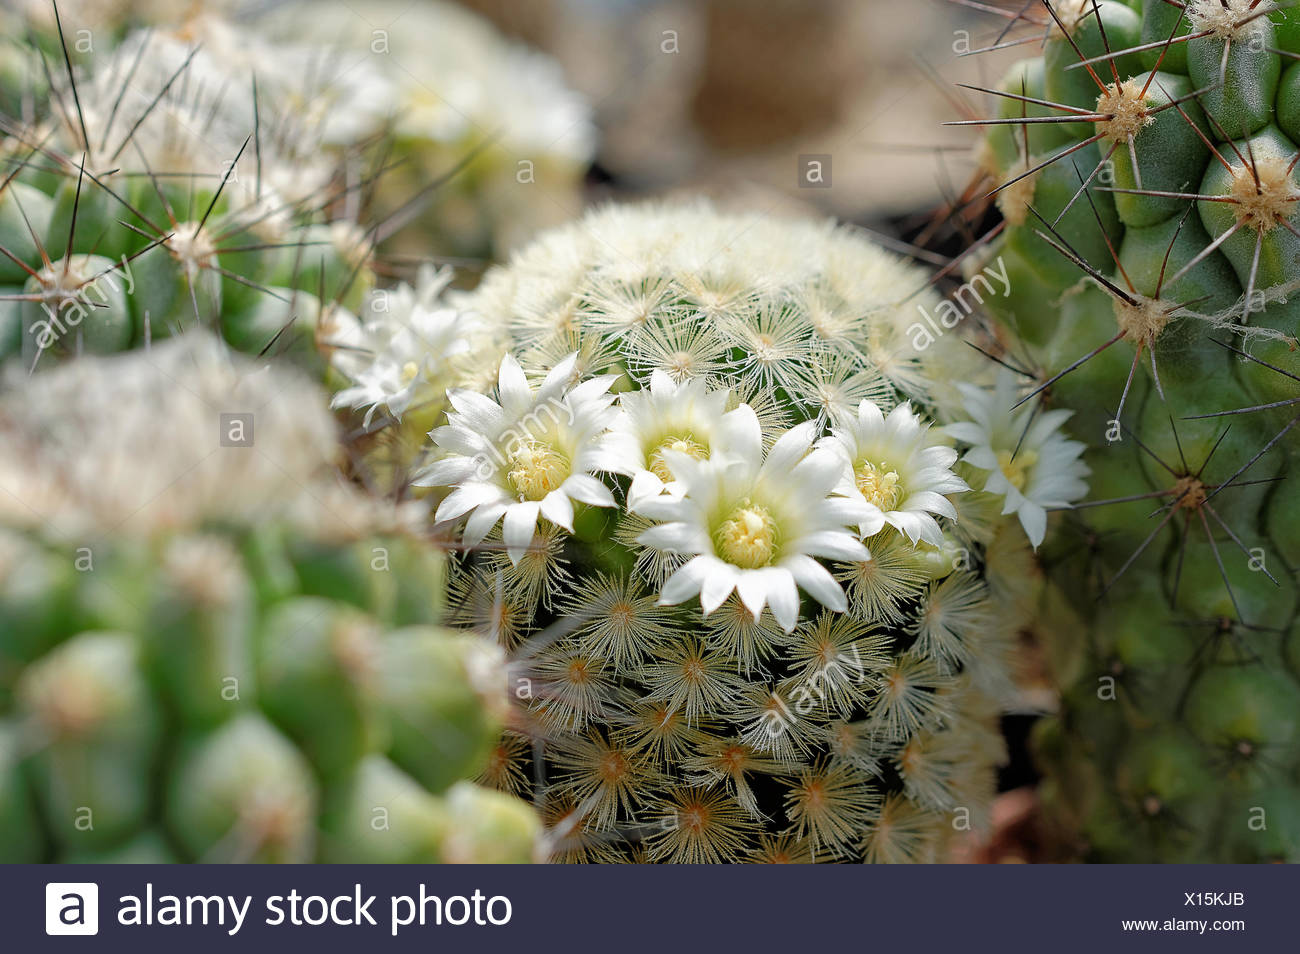 Cactus Mammilaria Spec With White Flowers Stock Photo 276105715